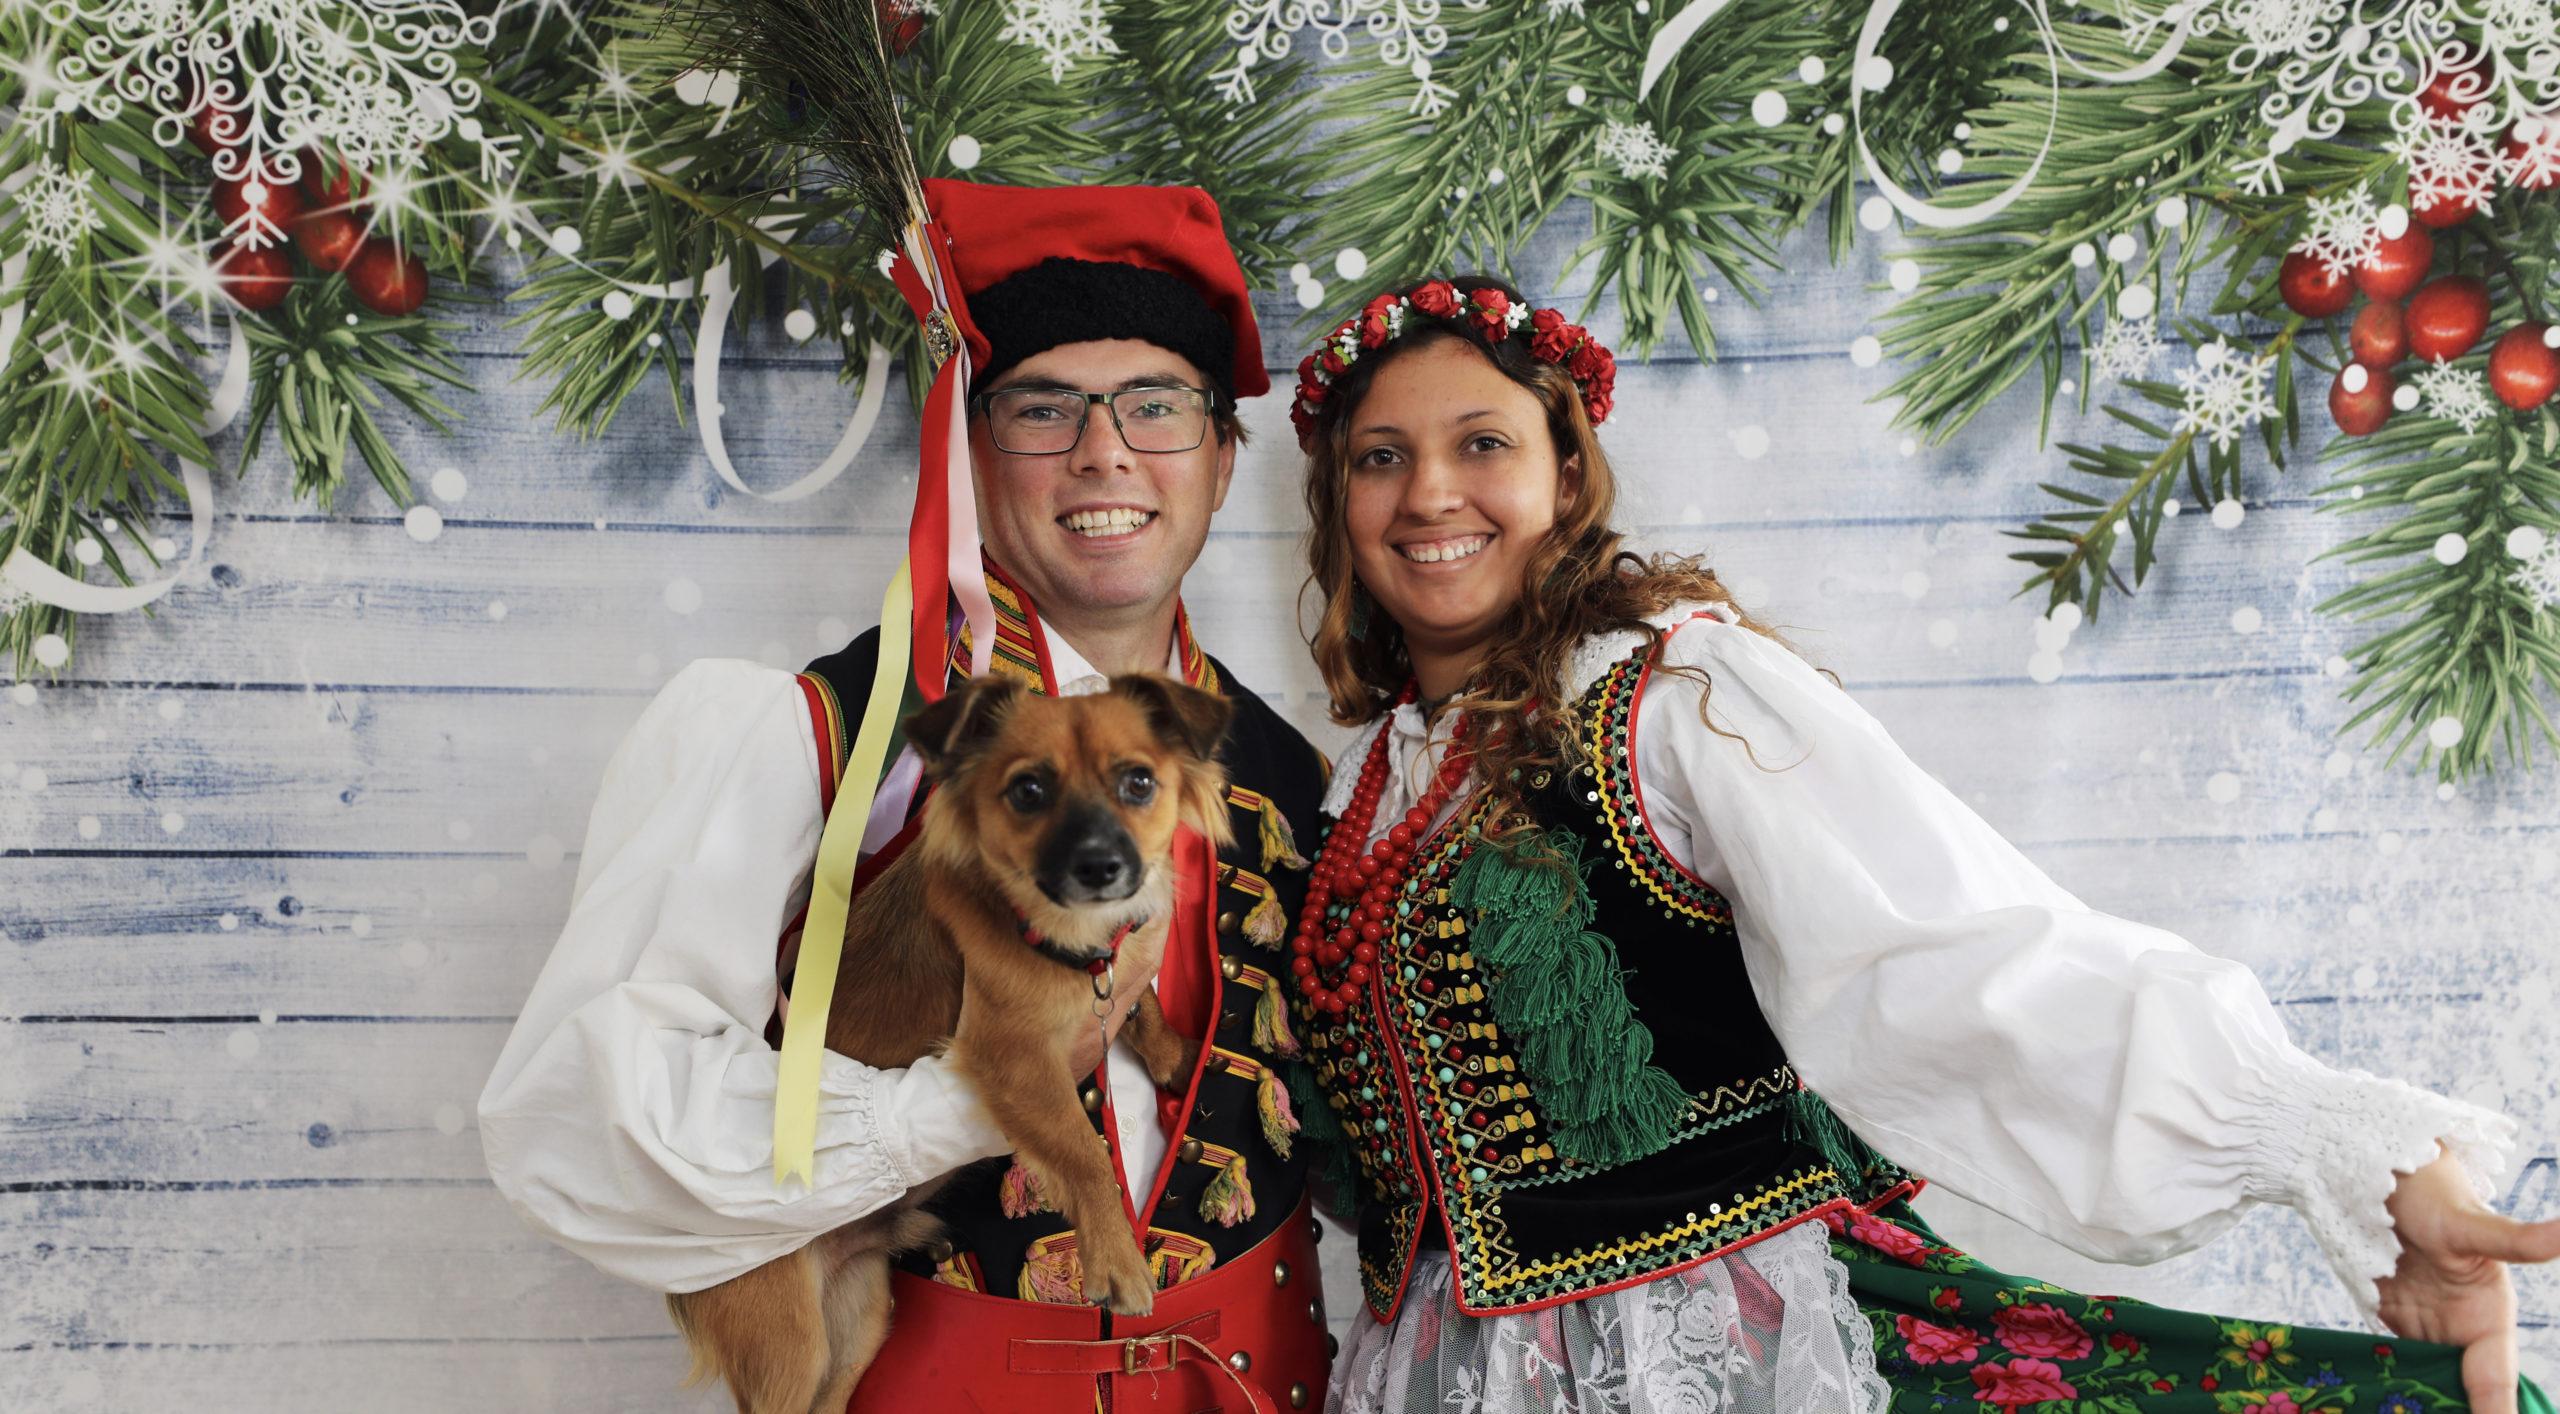 Polish Folk Christmas Card Photoshoot!